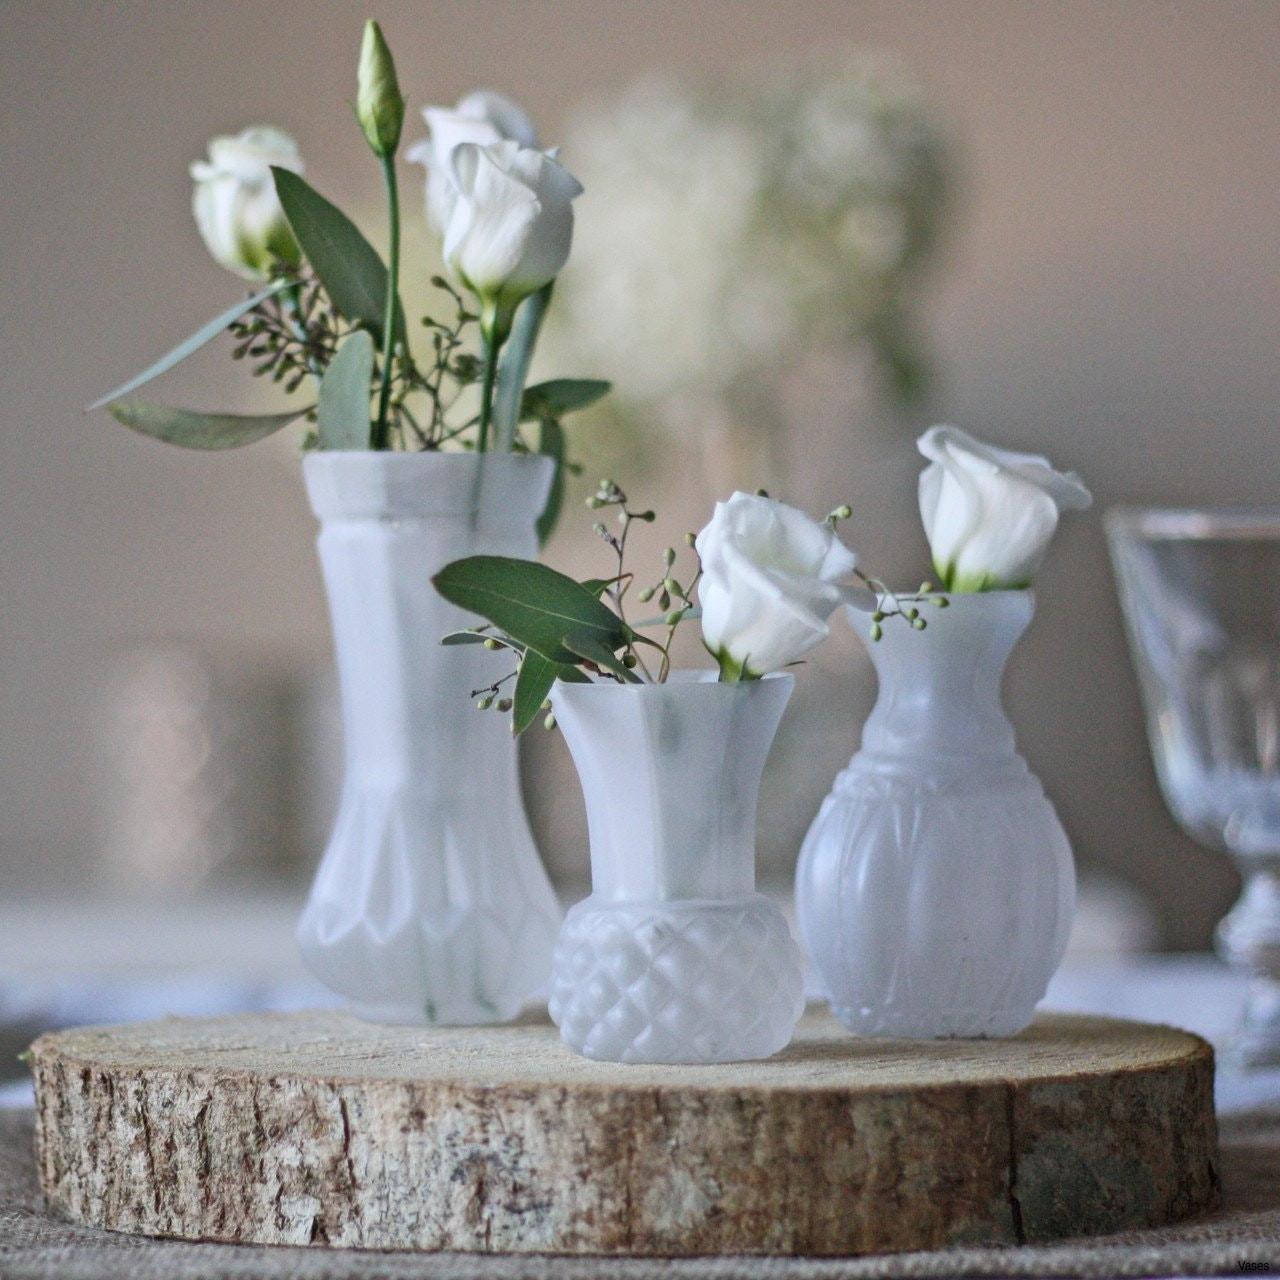 20 inch square vase of crystal vase centerpieces photos jar flower 1h vases bud wedding inside crystal vase centerpieces photos jar flower 1h vases bud wedding vase centerpiece idea i 0d white